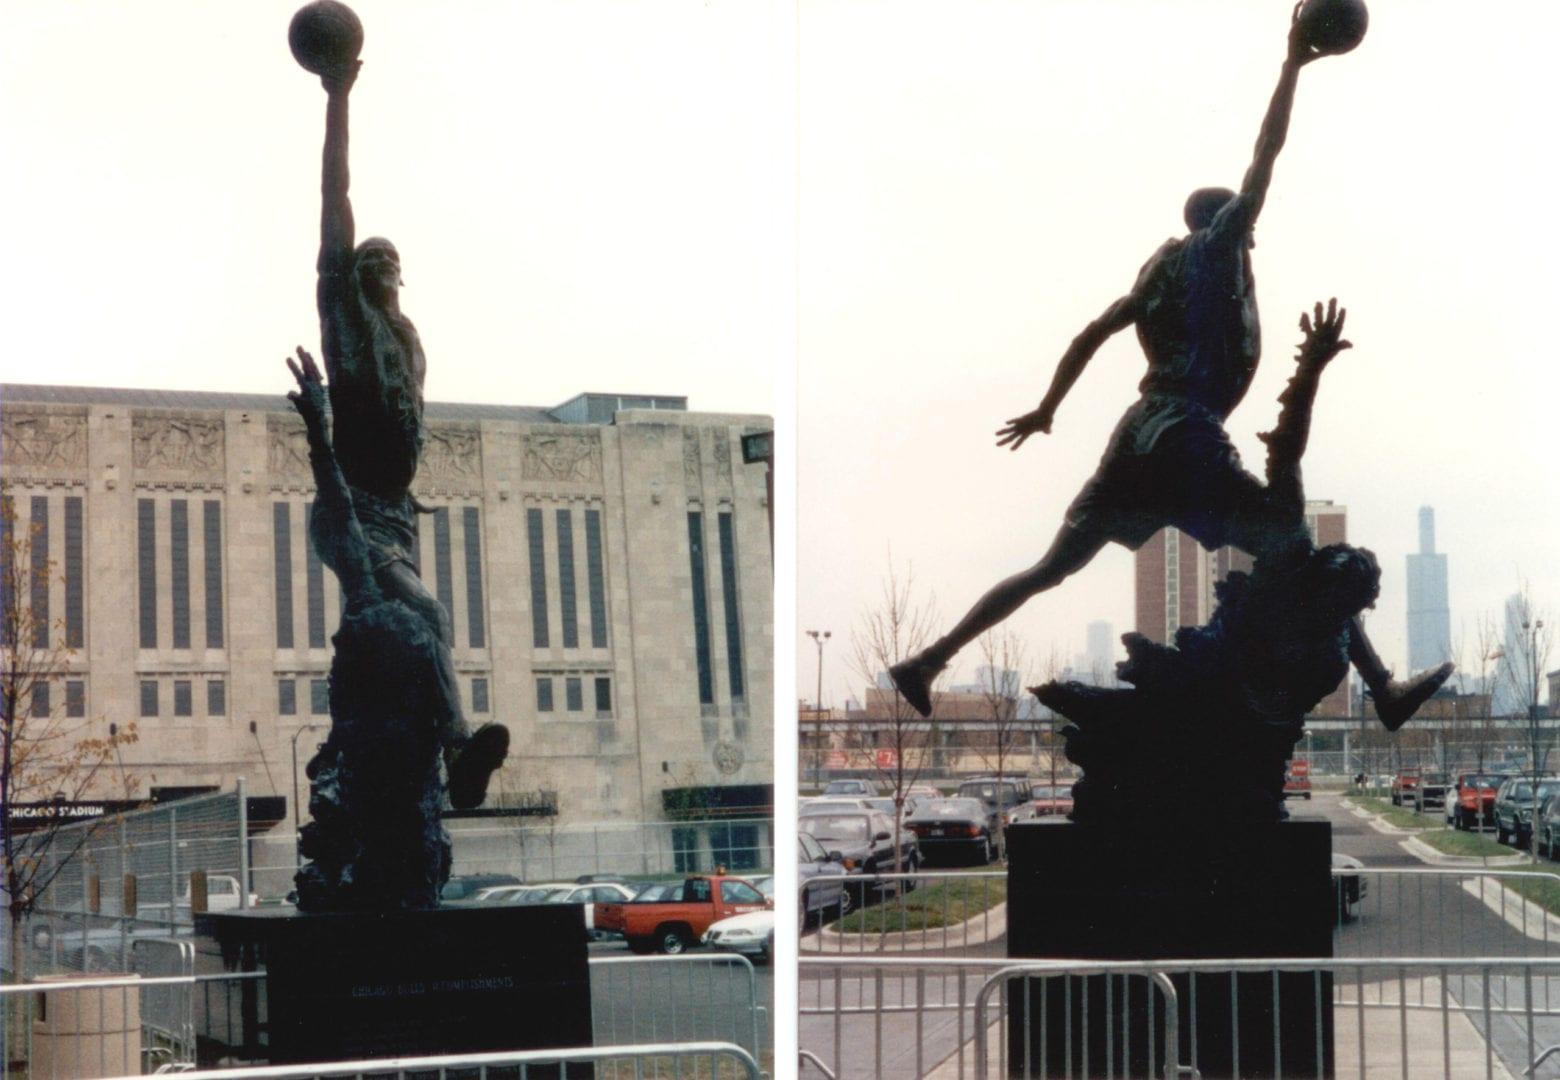 A statue of Michael Jordan